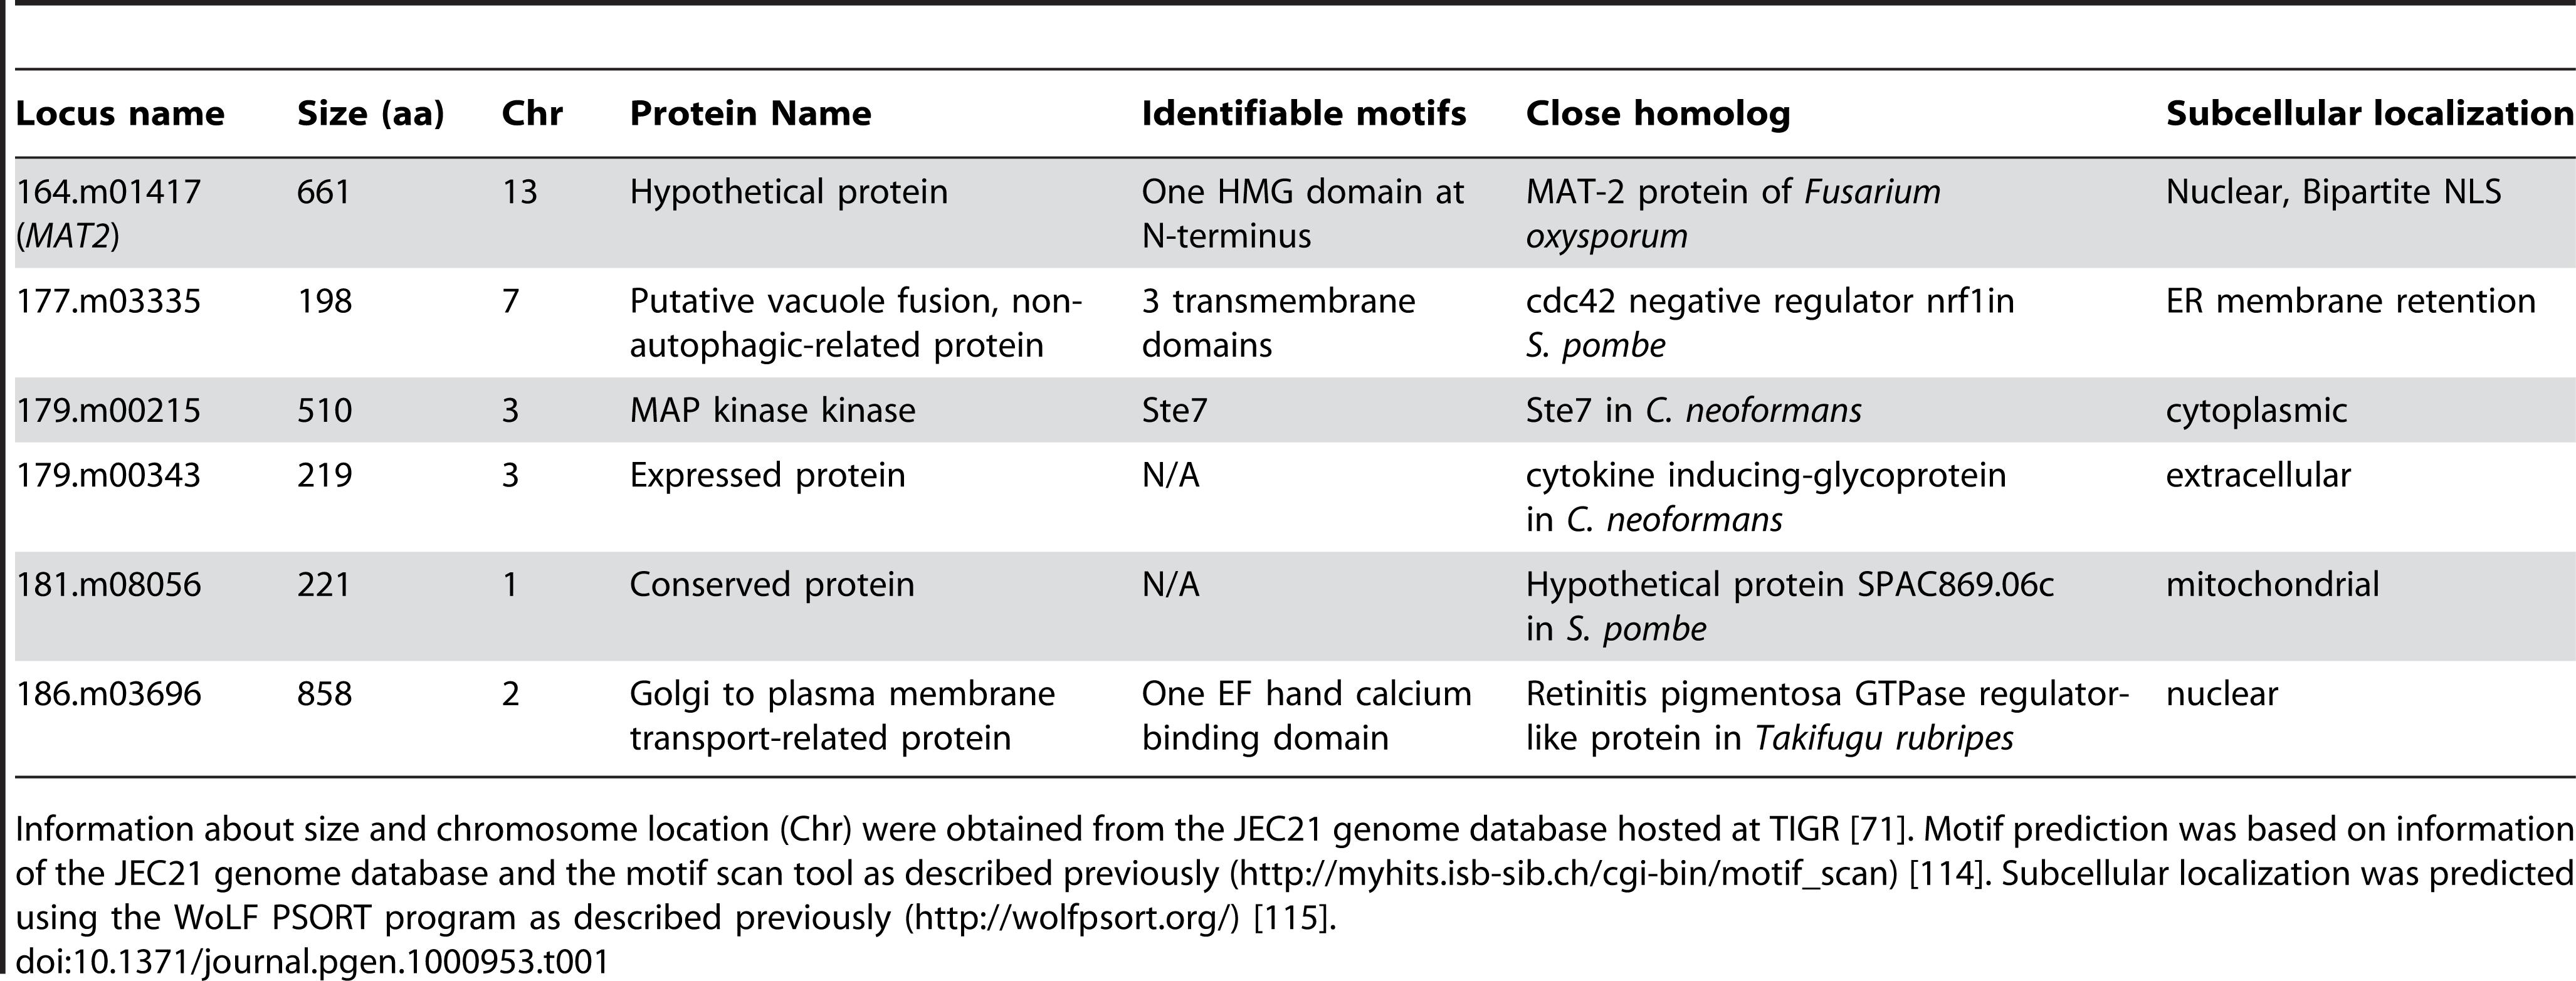 Genes necessary for filamentation based on insertional mutant phenotype.